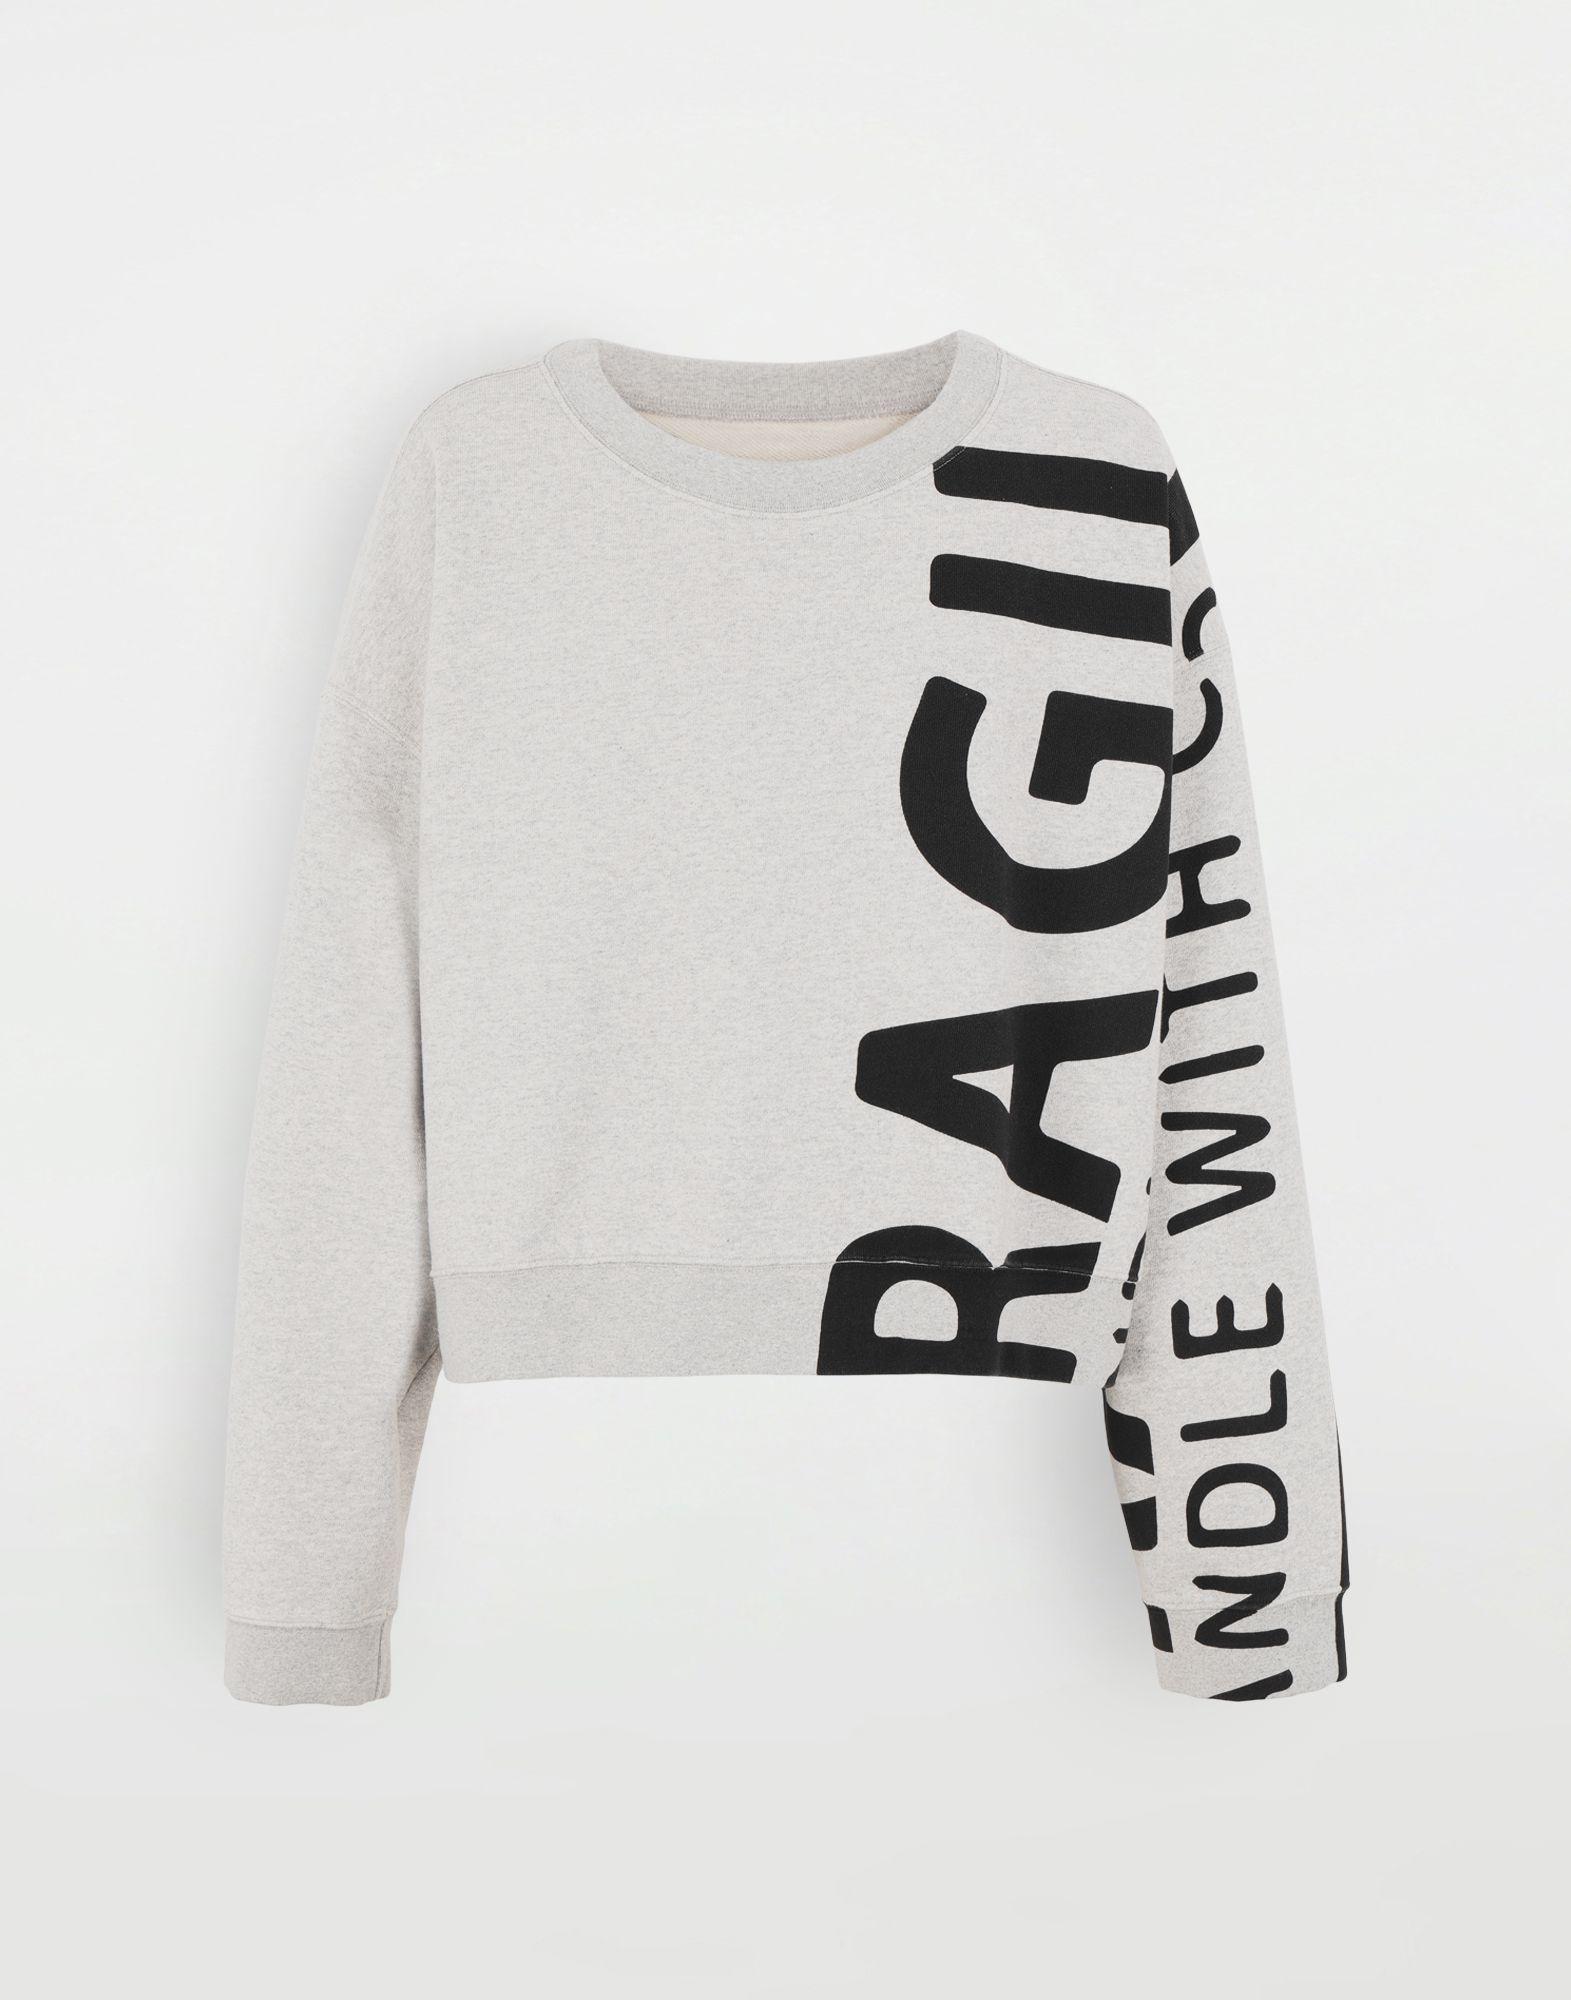 MAISON MARGIELA 'Fragile' sweatshirt Sweatshirt Man f